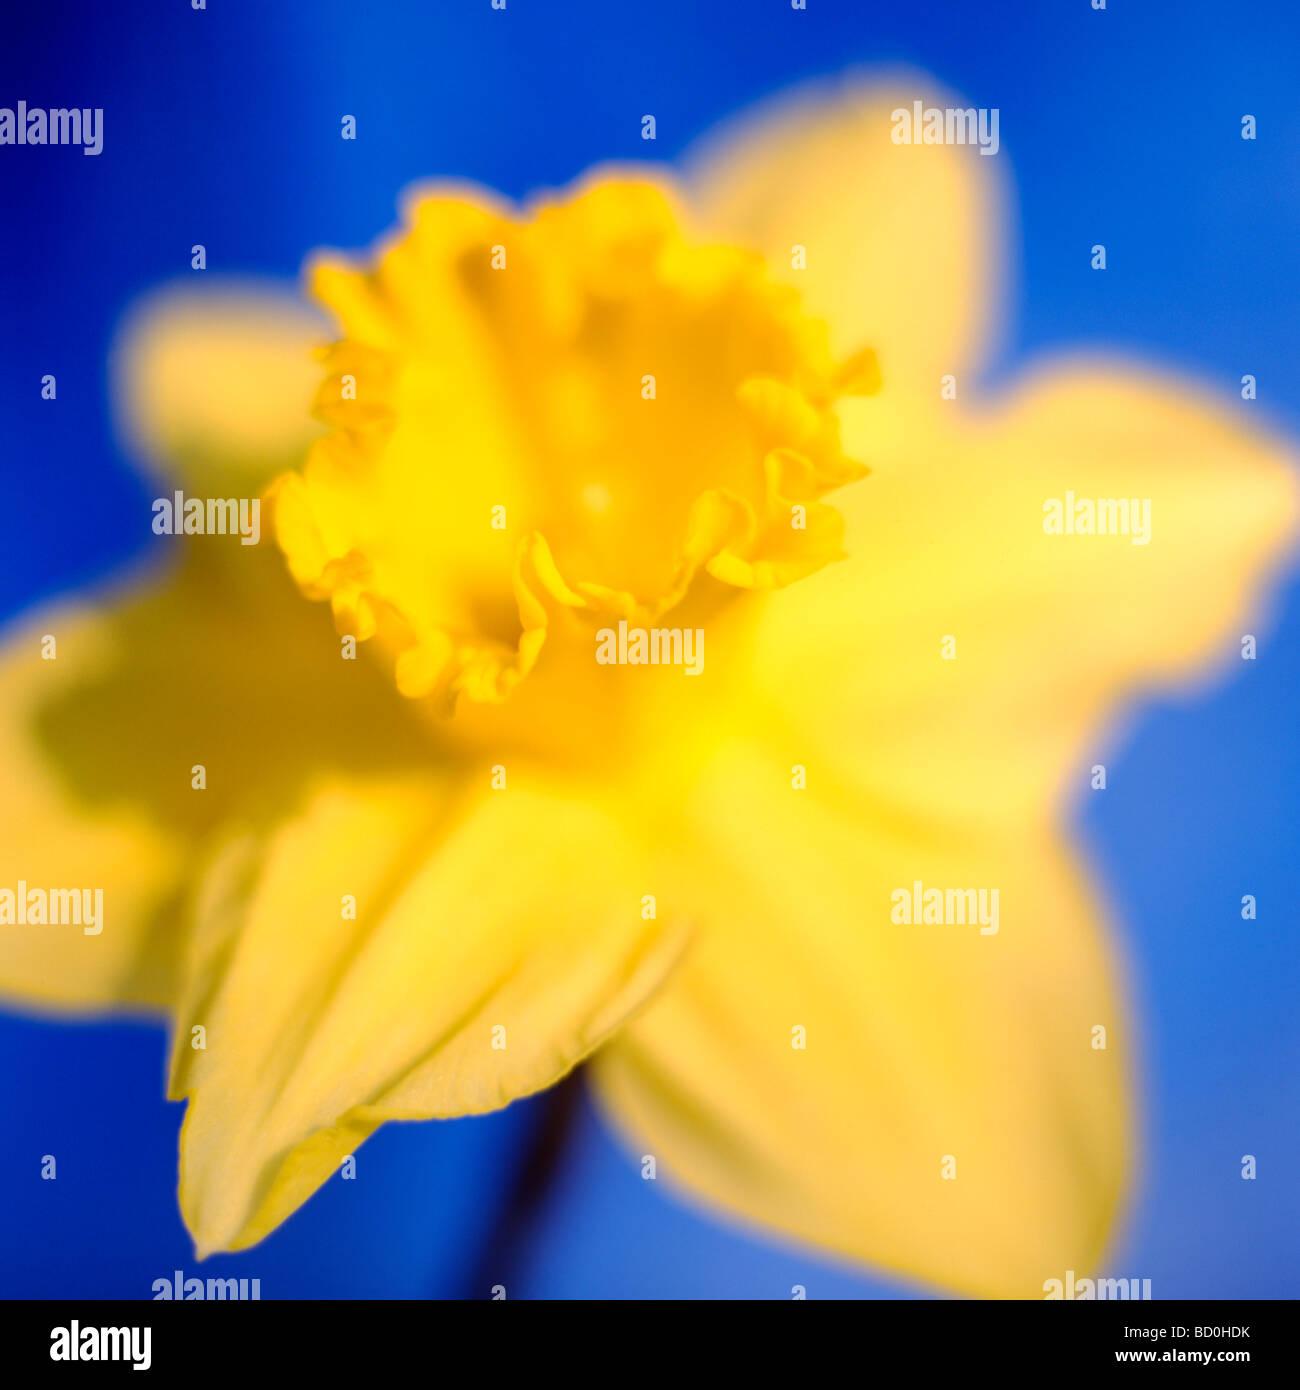 epitome of a springtime daffodil fine art photography Jane Ann Butler Photography JABP286 - Stock Image